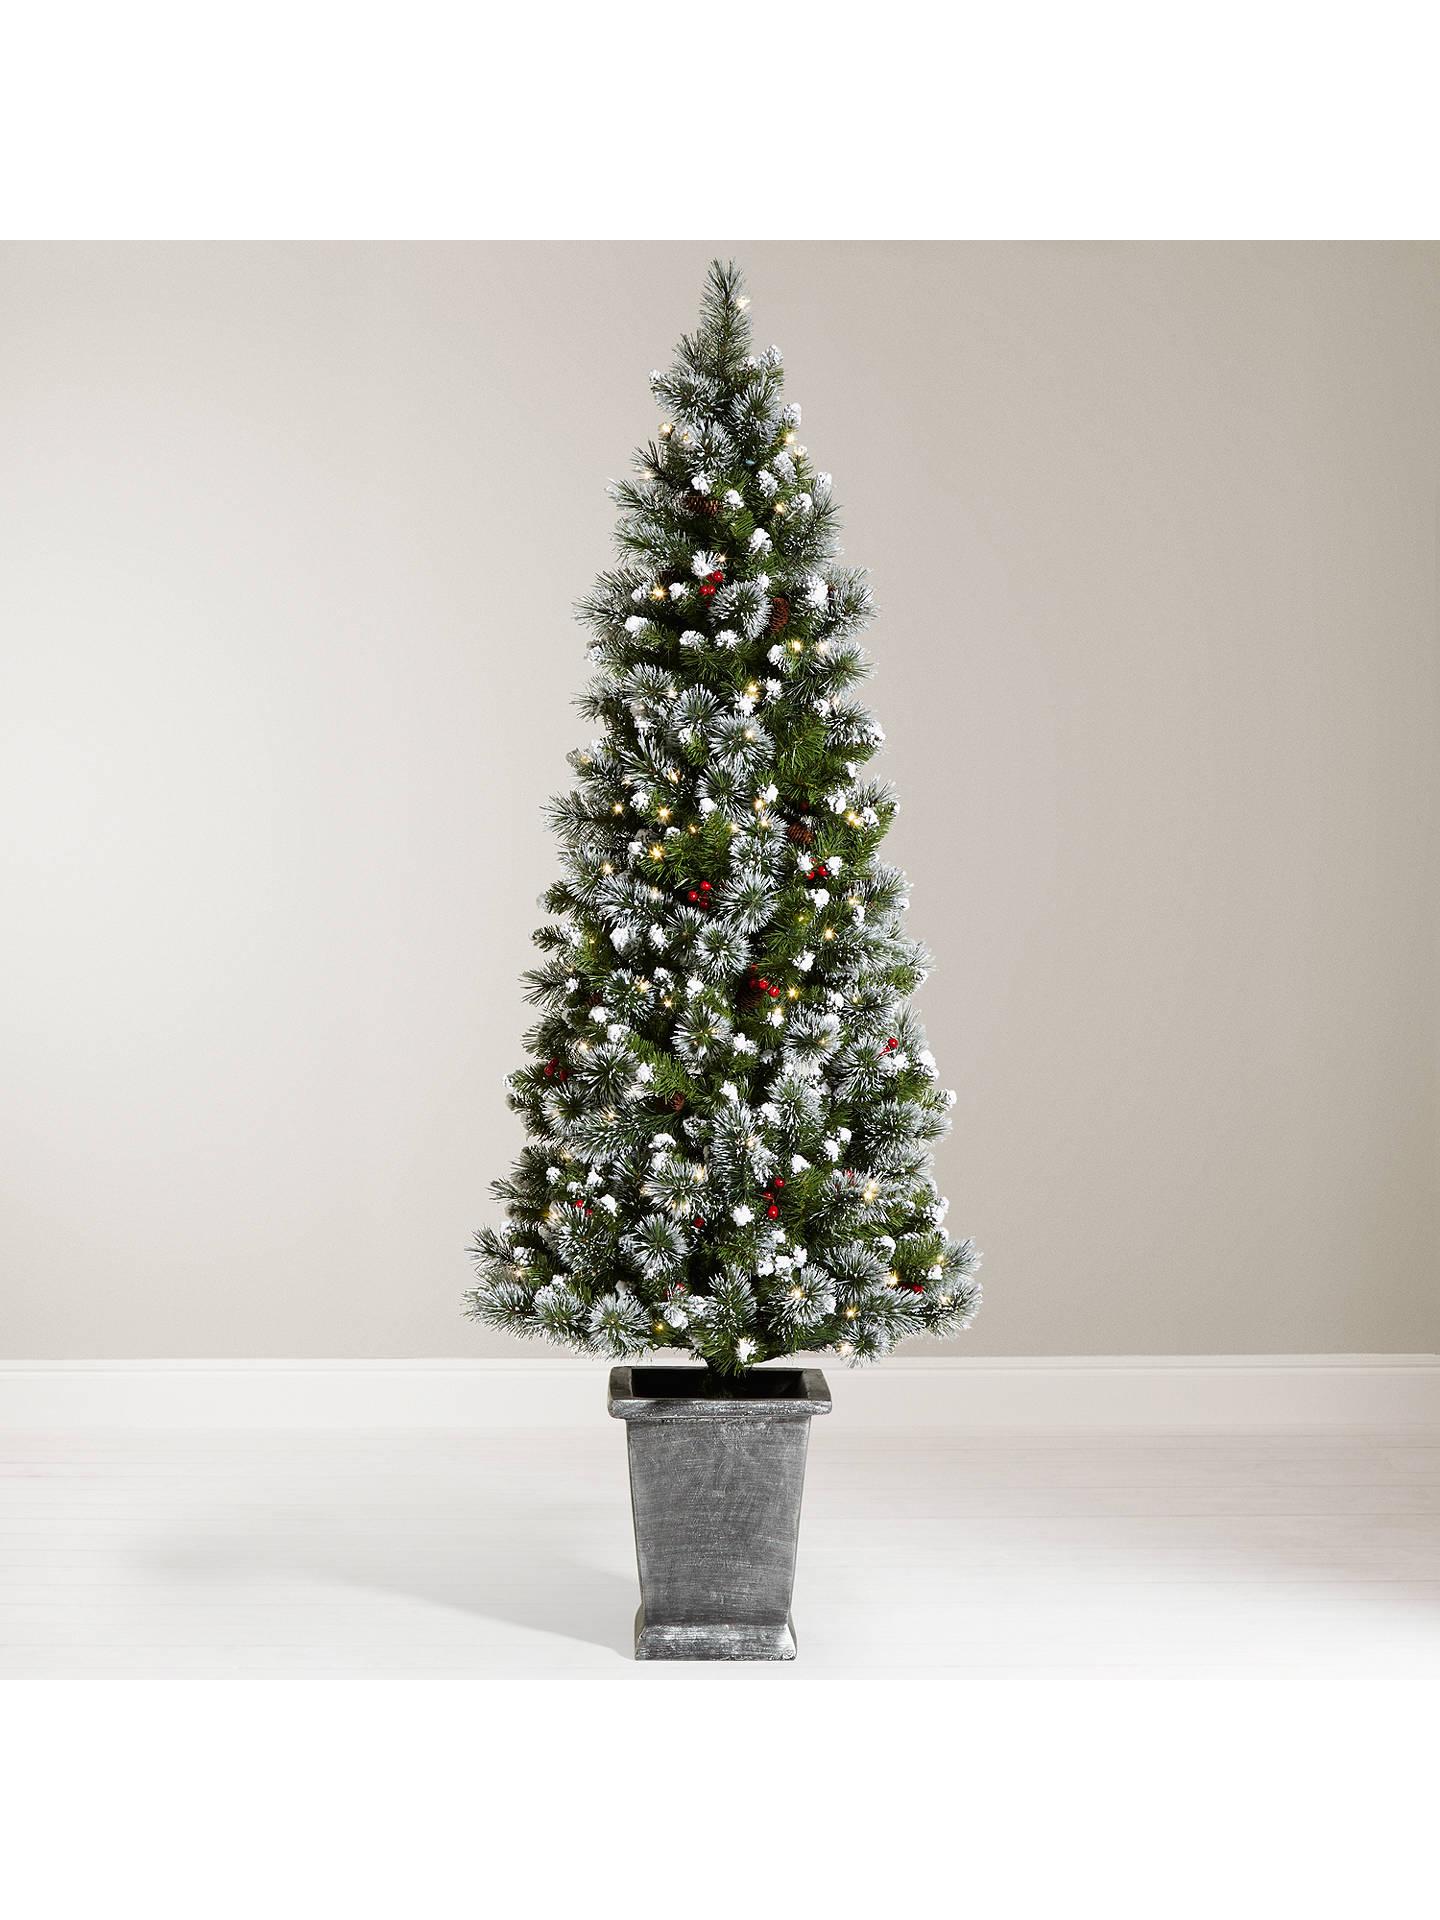 BuyJohn Lewis Chamonix 6ft Pre-Lit Potted Christmas Tree Online at johnlewis.com ...